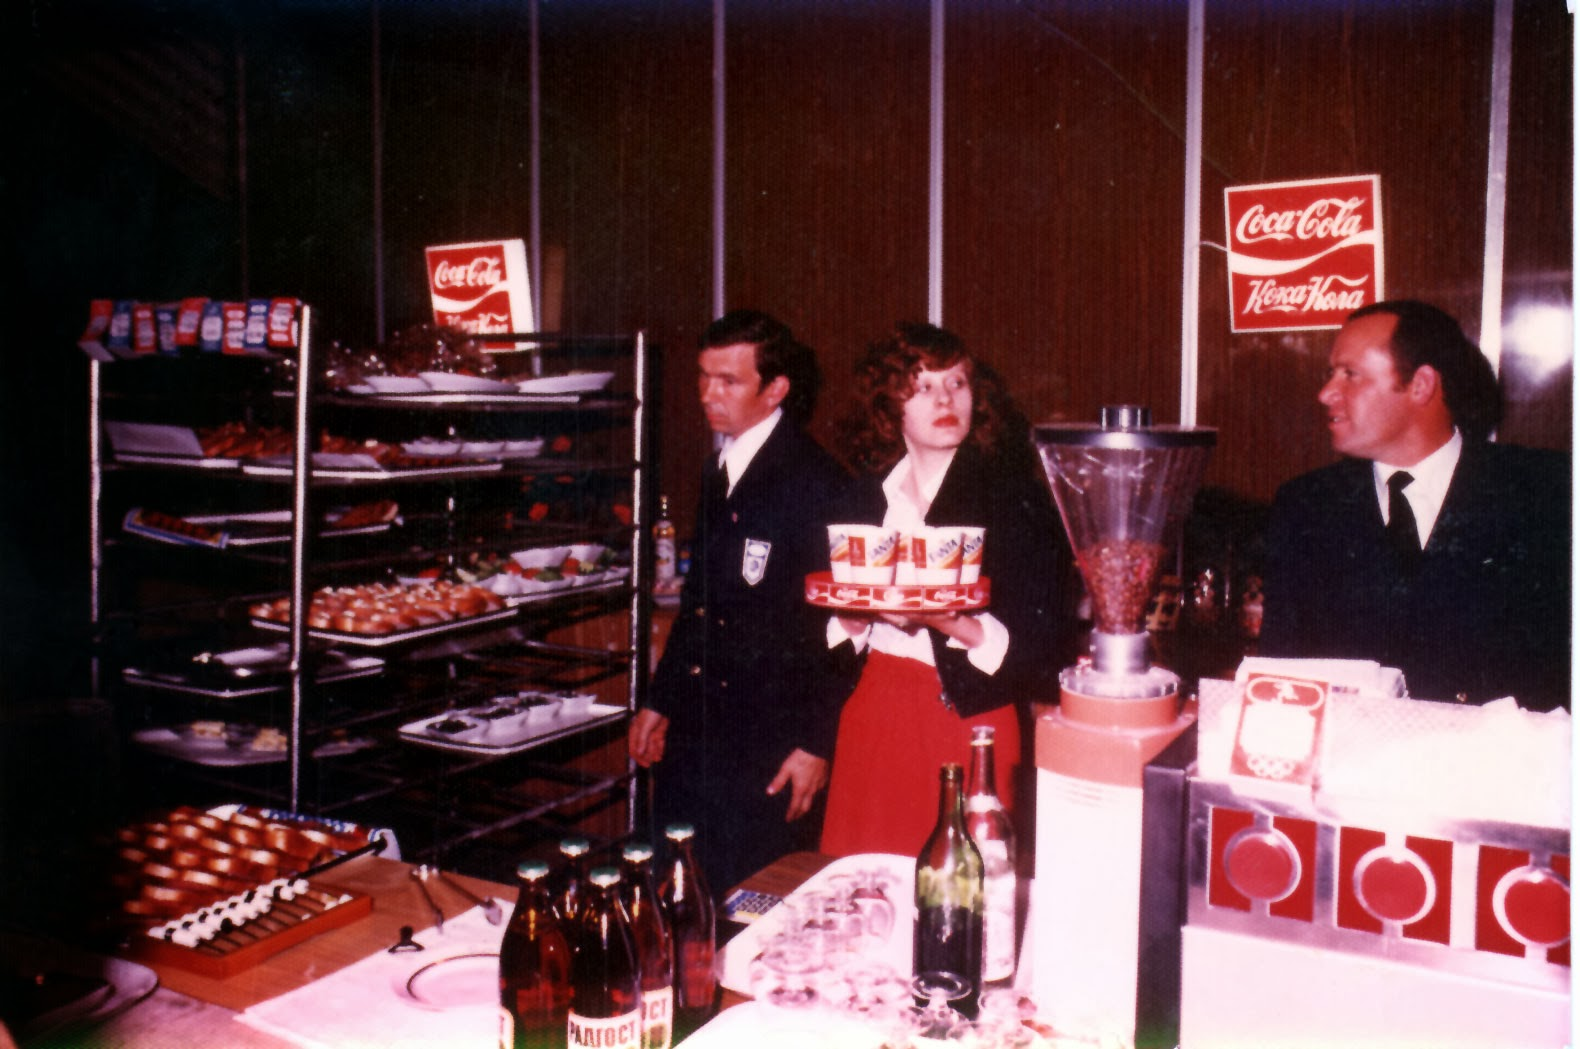 10. На волне демократизации СССР в конце 80-х «Кока-Кола» совершила свое победное Back in the USSR.